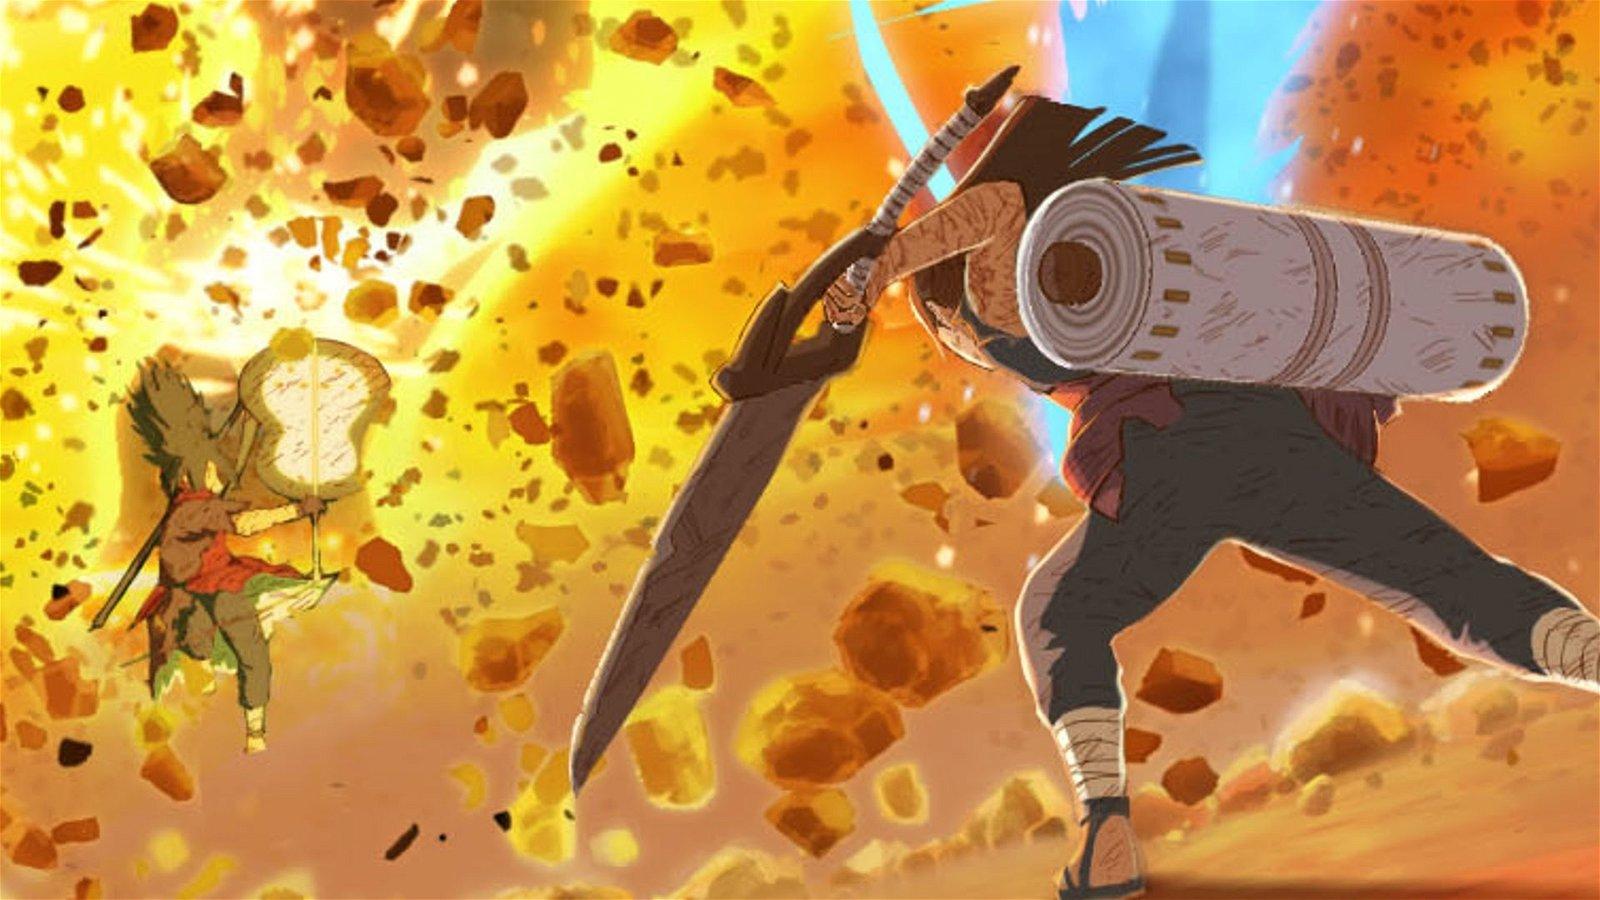 Naruto Shippuden Ultimate Ninja Storm 4 (Ps4) Review